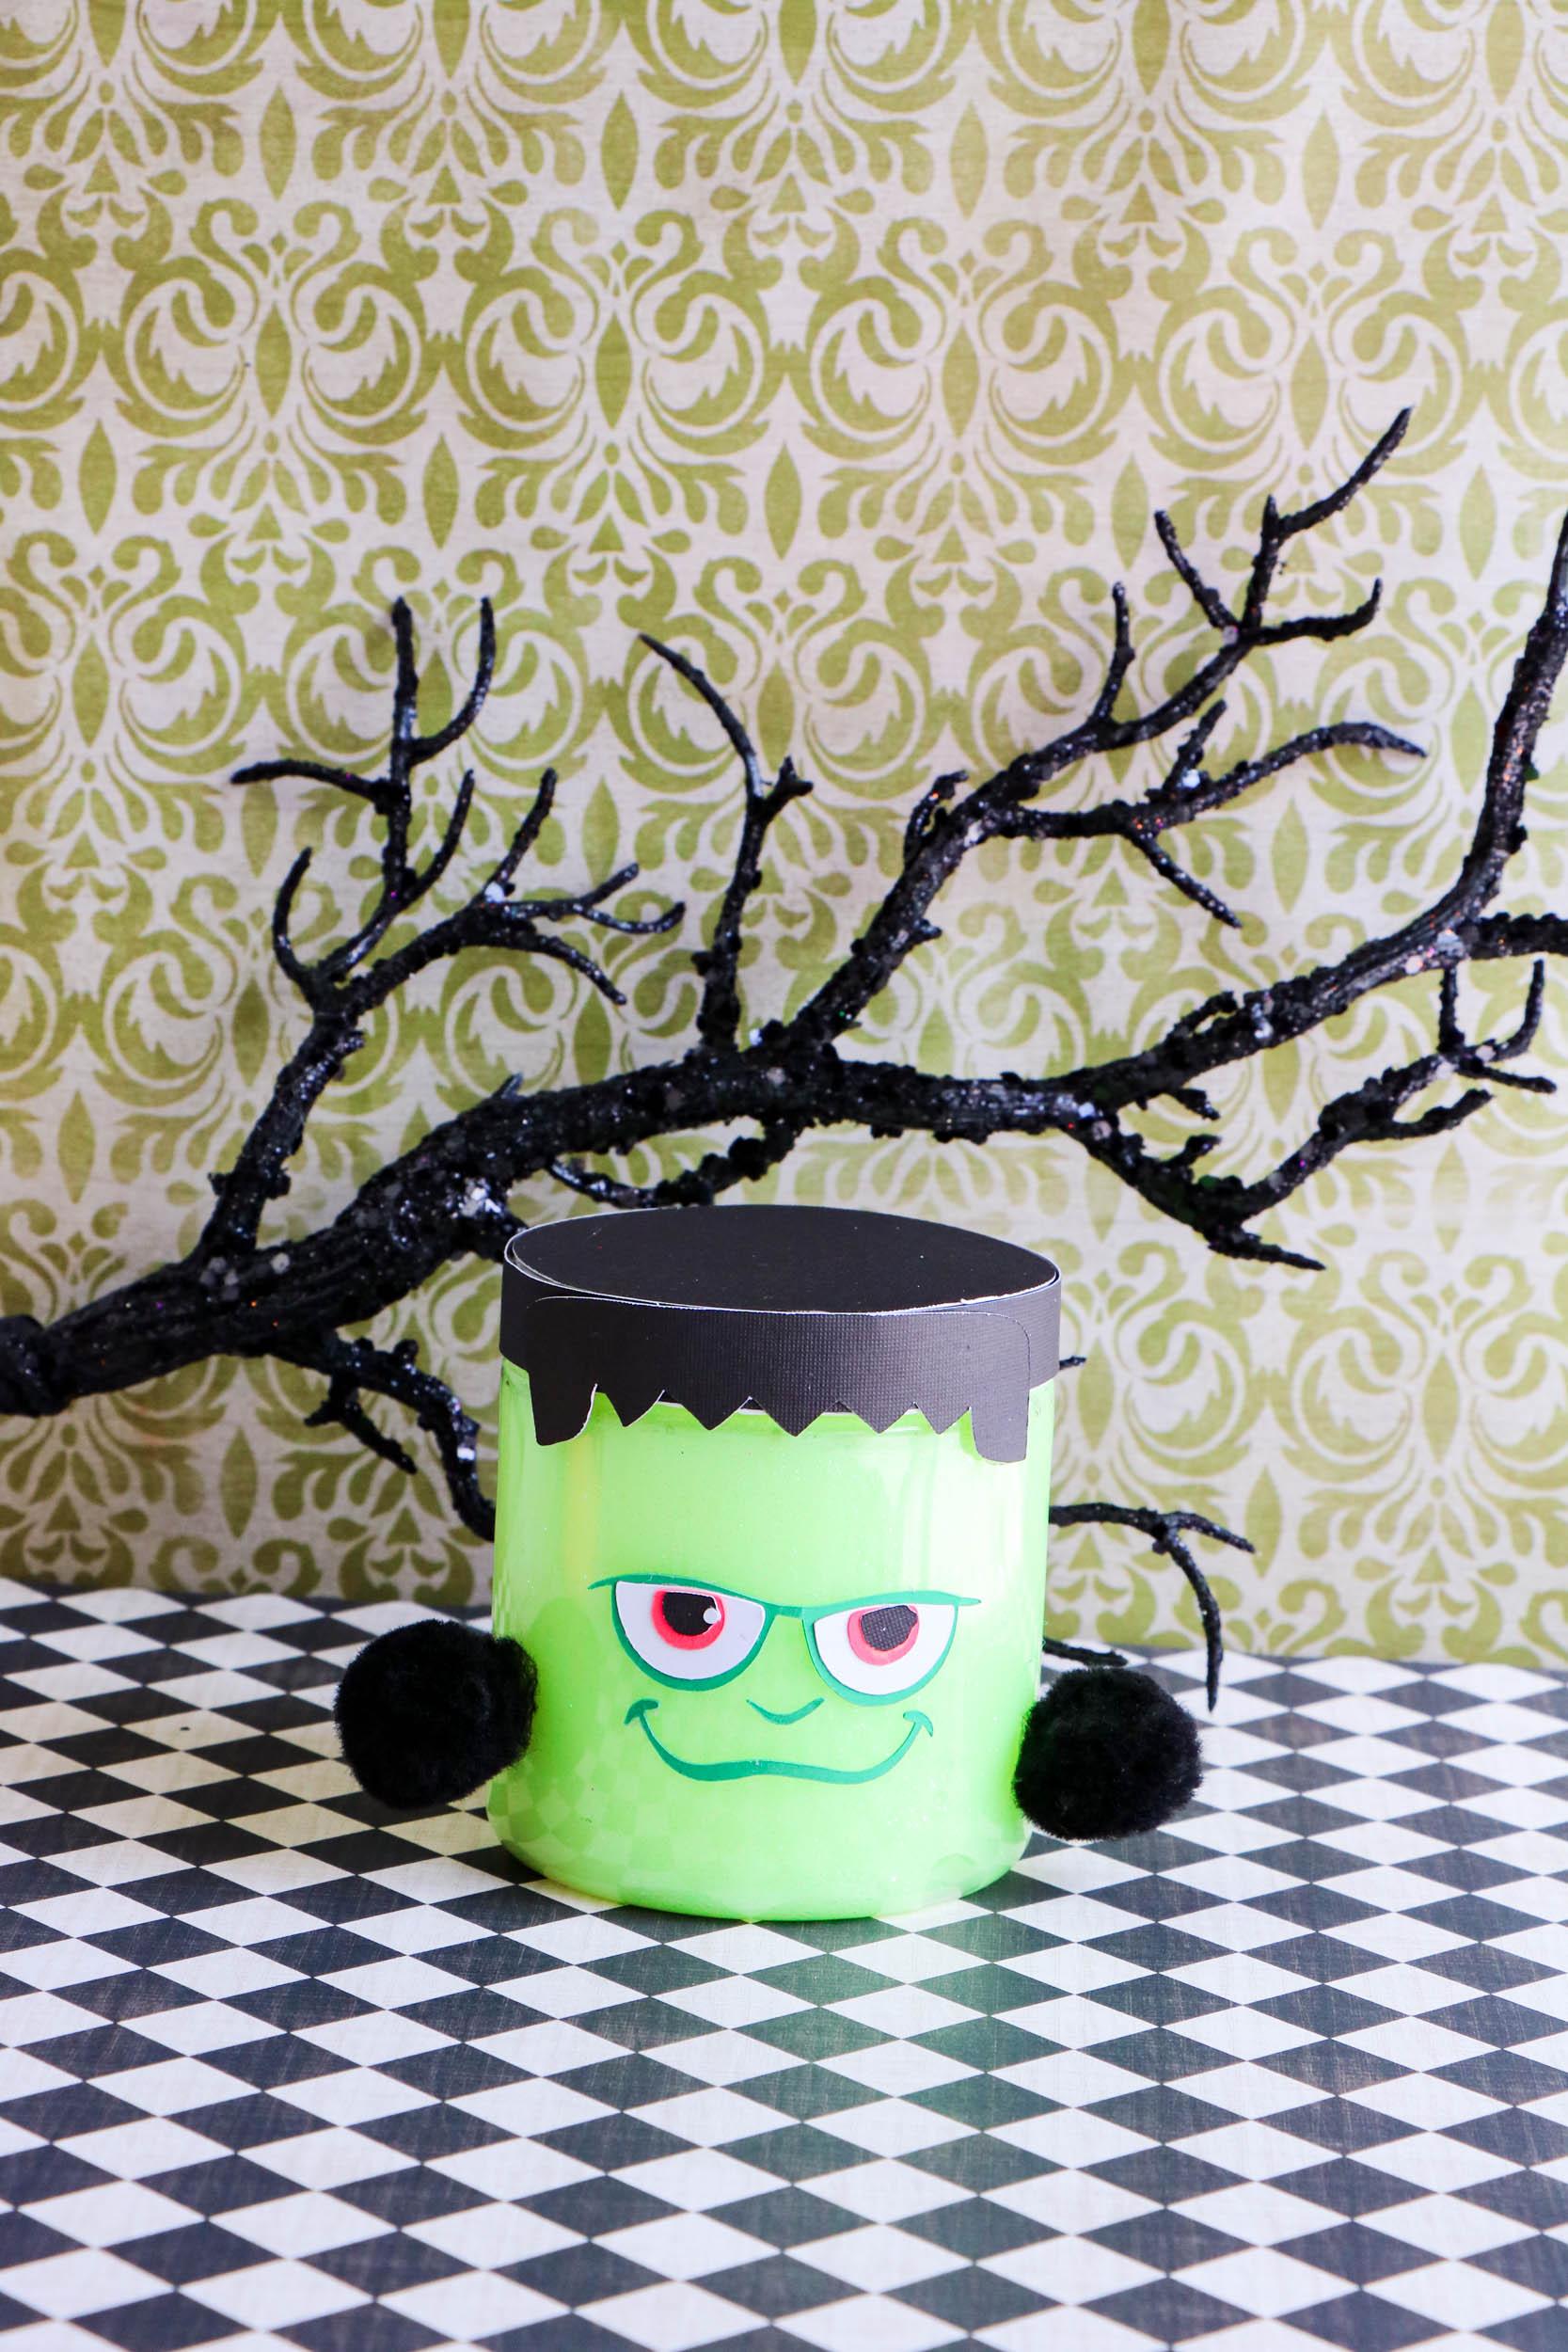 Frankenstein Glow in the Dark Slime